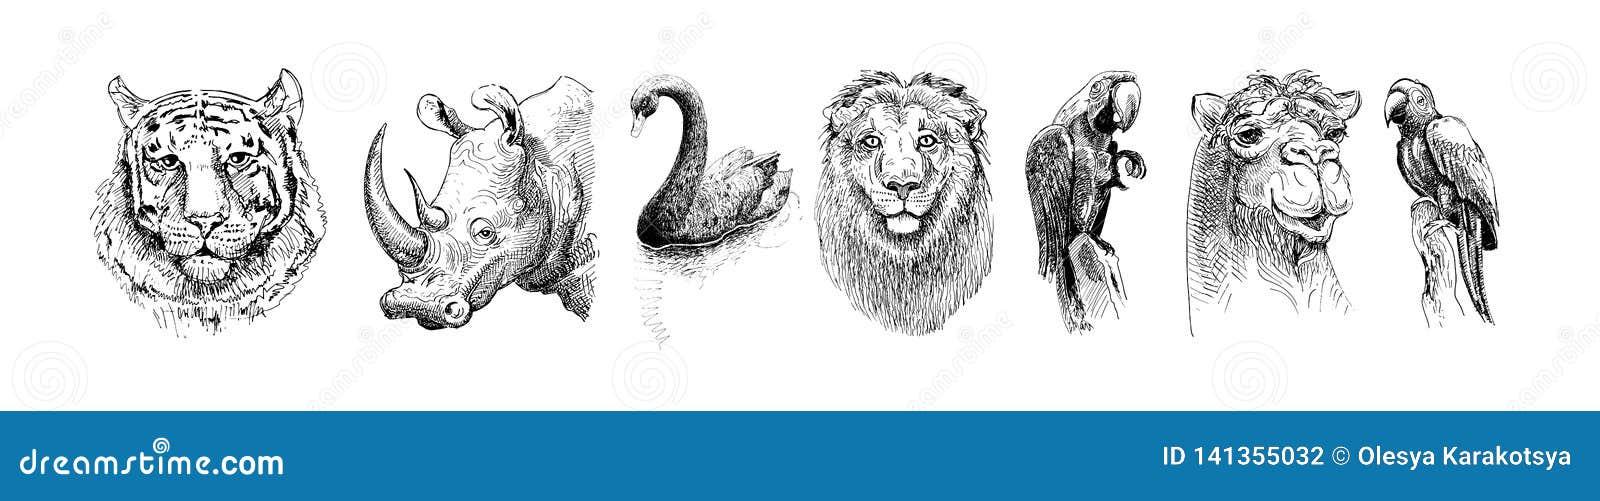 Set of safari head animals, black and white sketch drawing